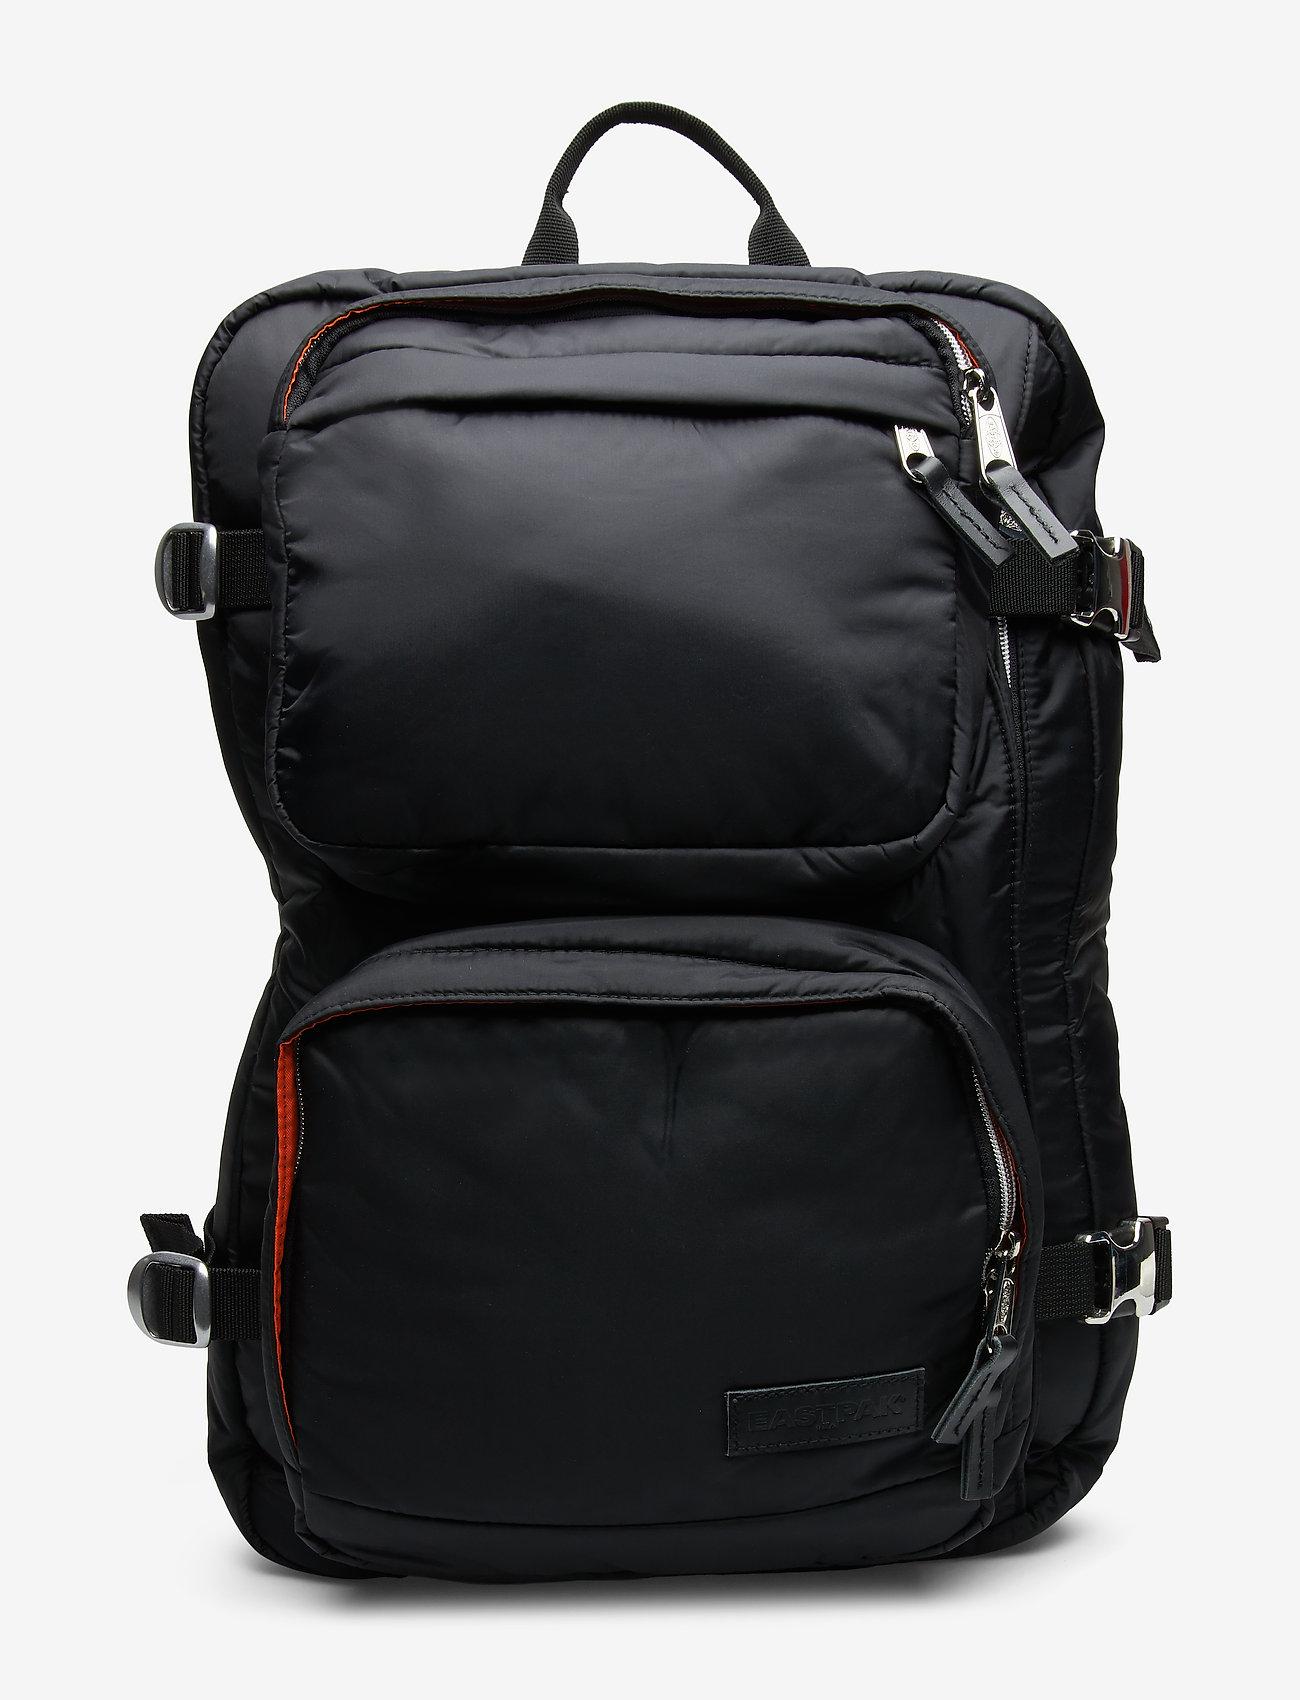 Eastpak - TRAWEL - sacs a dos - tailored black - 0